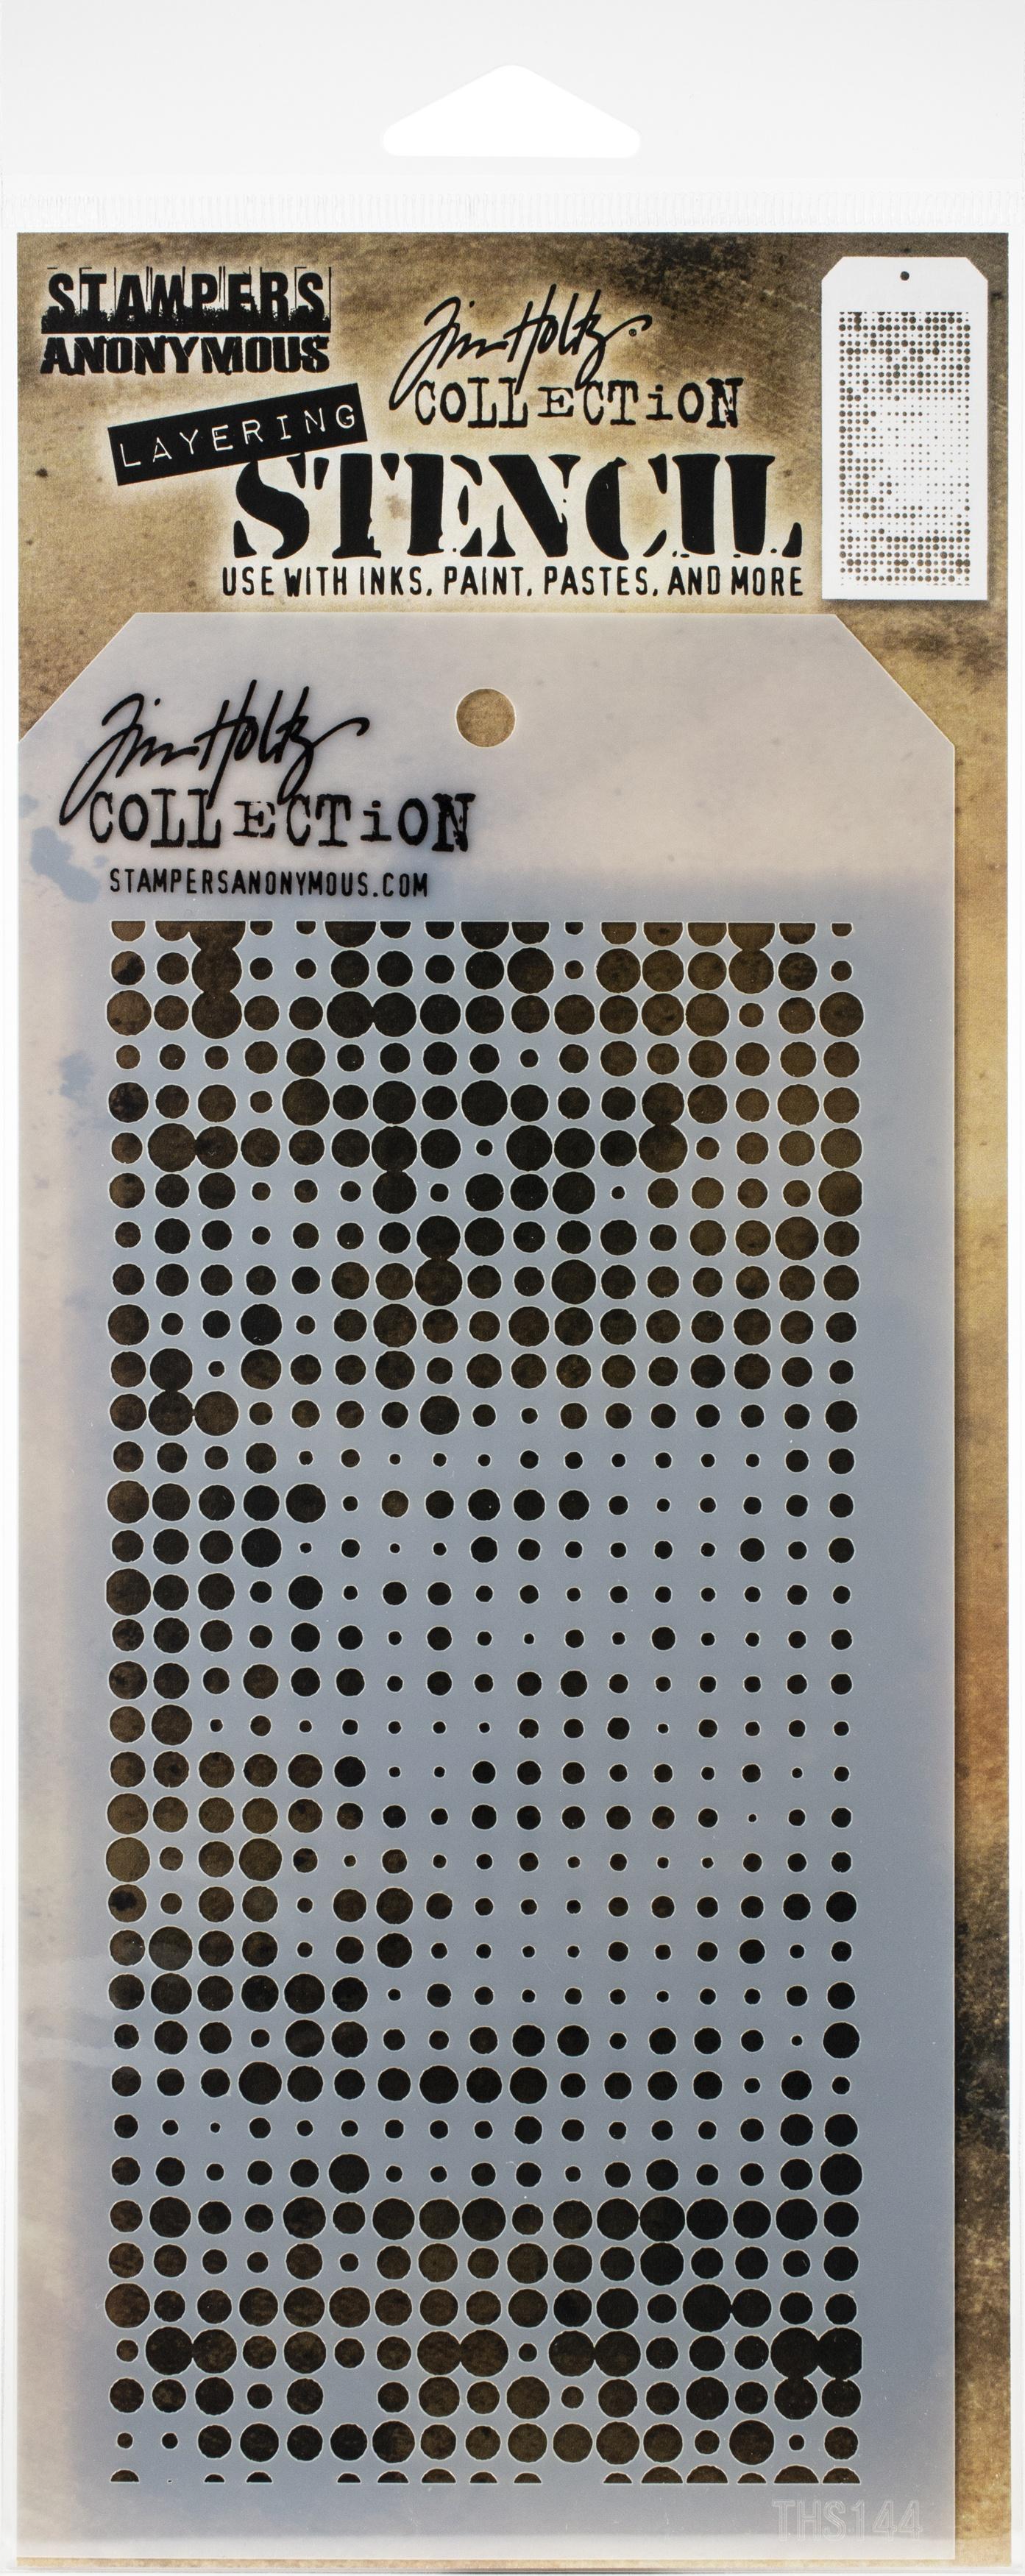 Tim Holtz Layered Stencil 4.125X8.5-Halftone -Layered